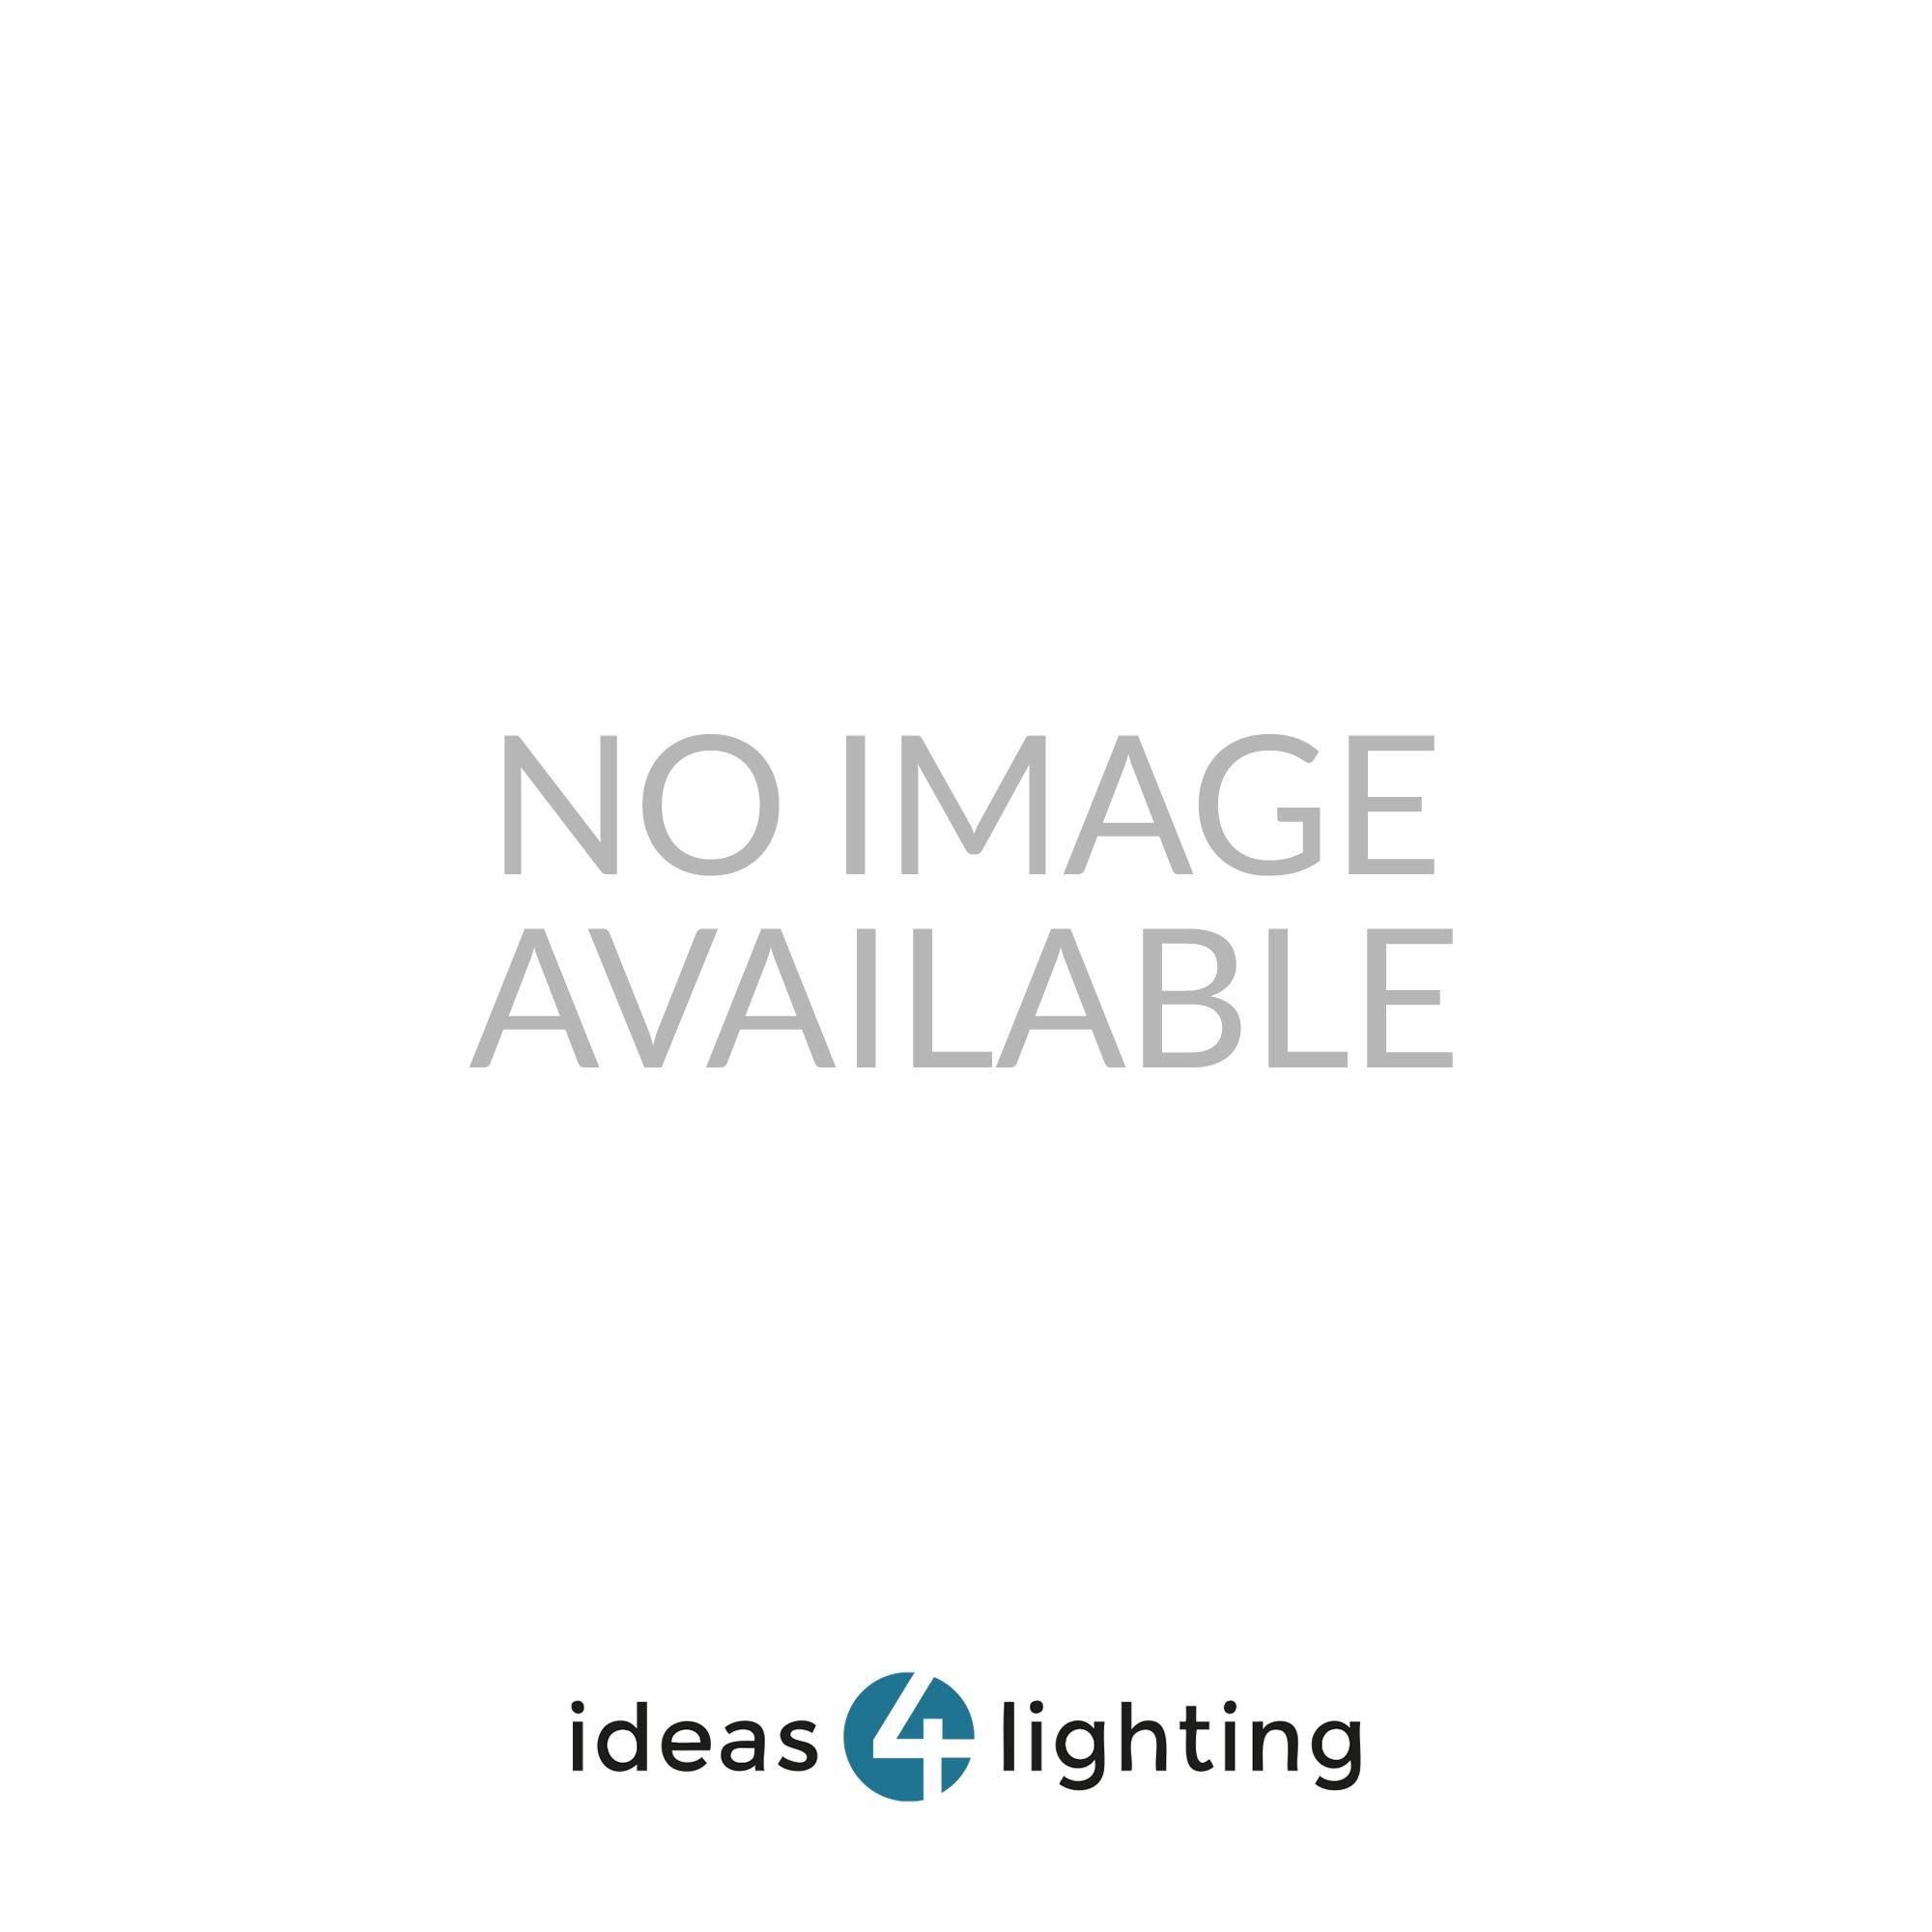 Lucide 14881/05/31 DINGO Wall Light LED GU10/4.5W IP44 White ideas4lighting SKU18344I4L